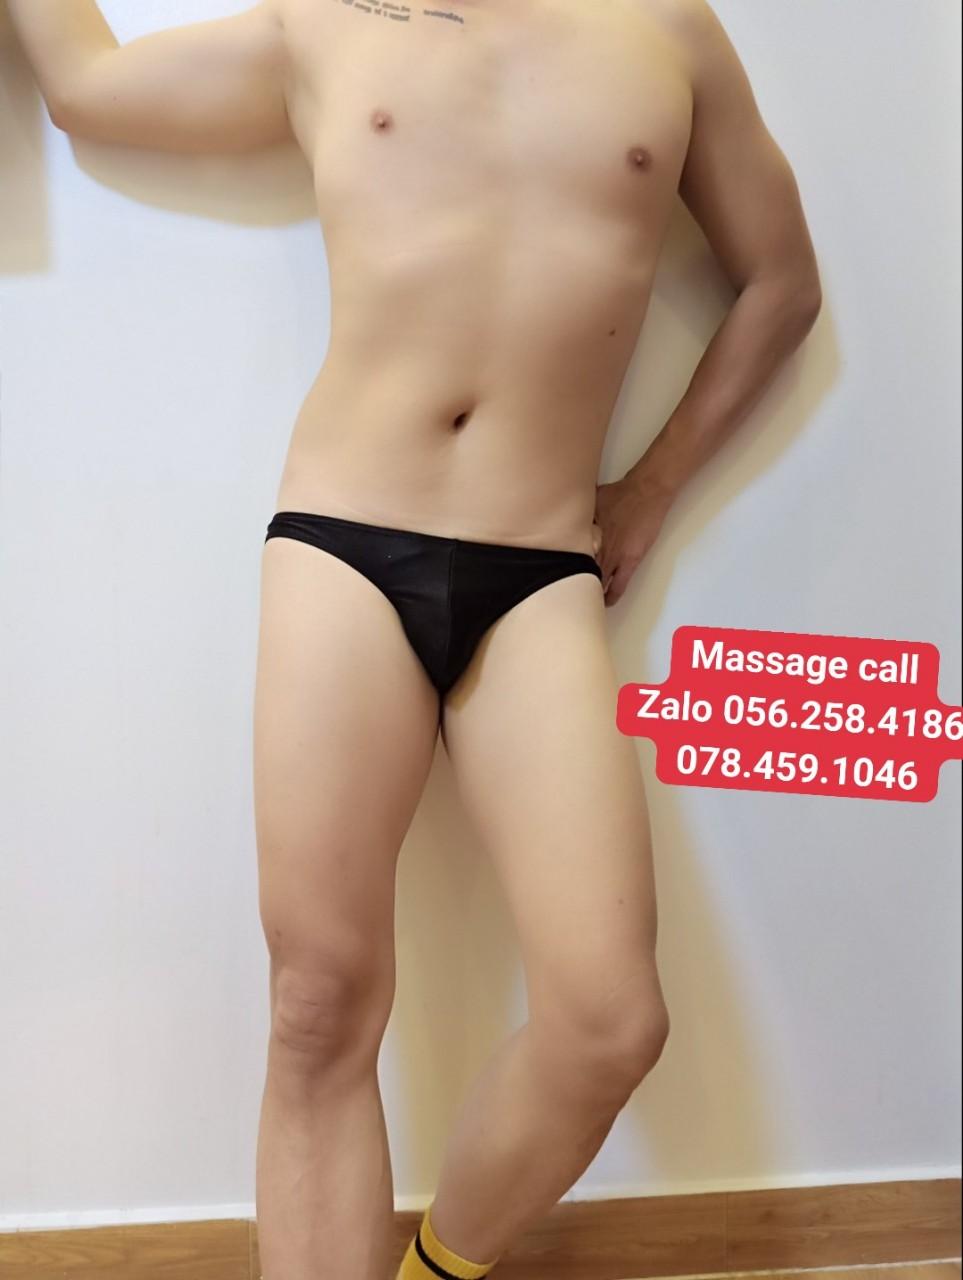 Massa khỏe, ms sex và call